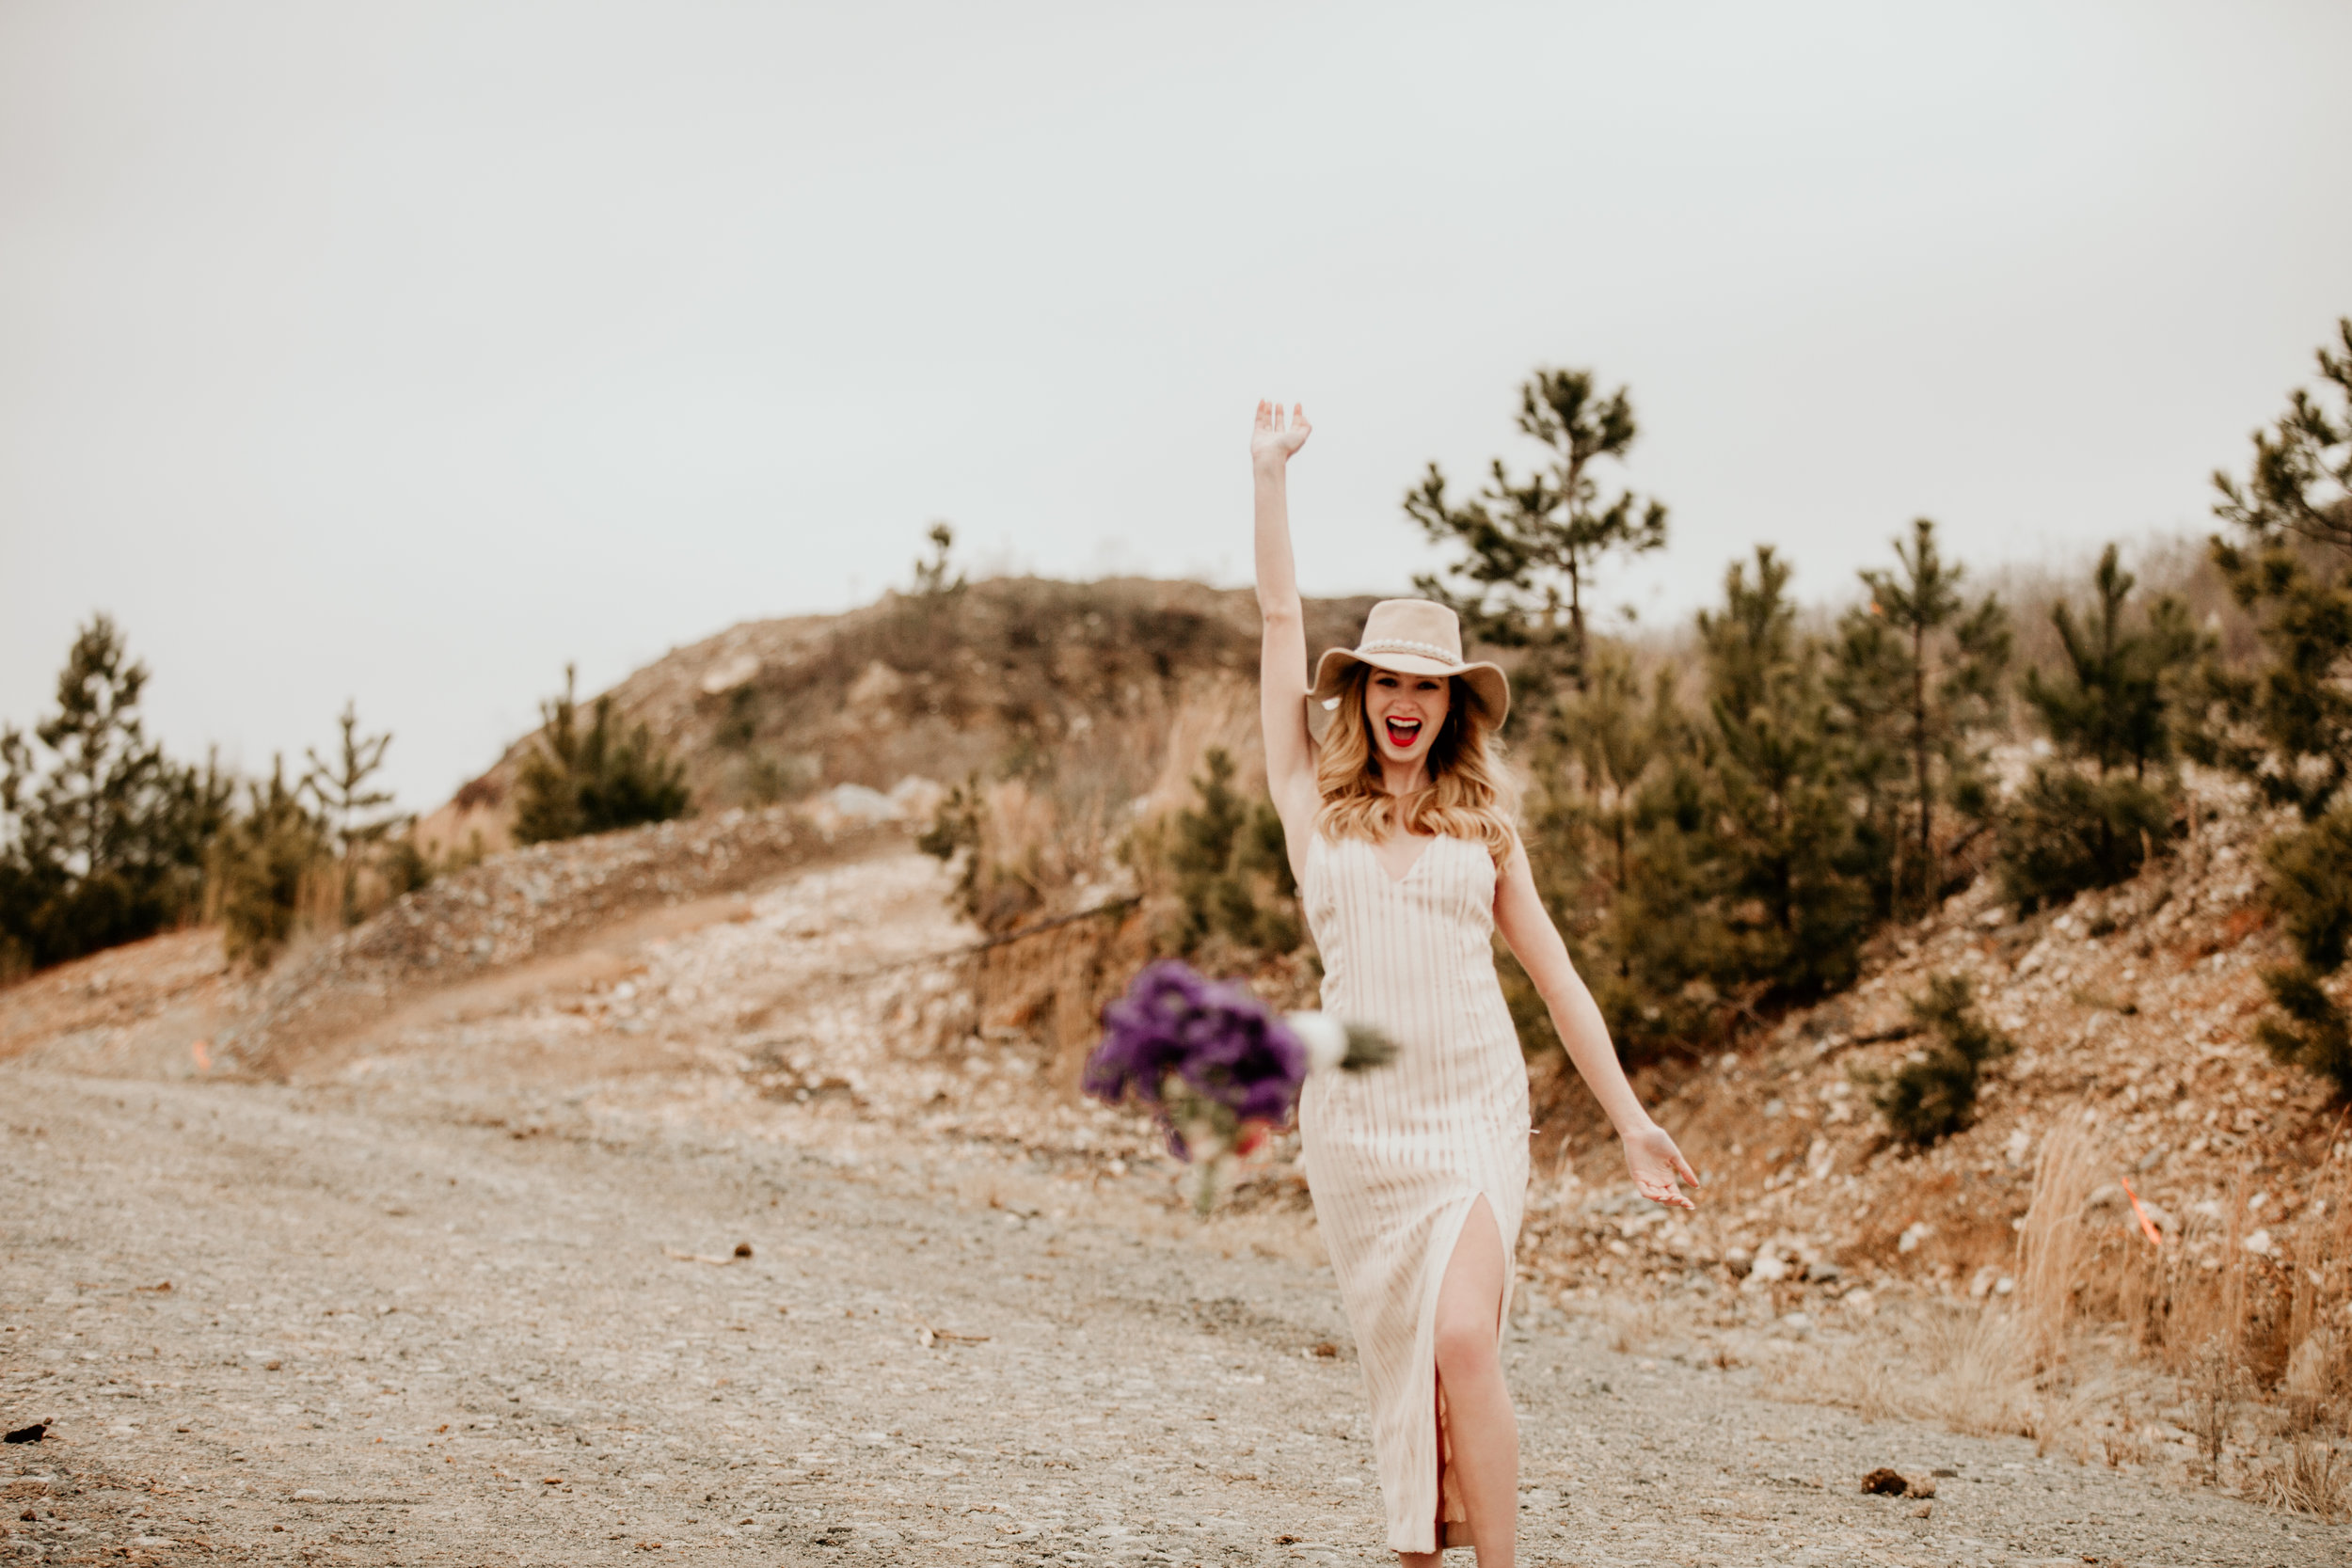 dessert-conway-central-arkansas-bridal-photographer-little-rock-photography-outdoor-wedding-boho-fashion-engagement-elopement-bouquet-bride-soiree-magazine-photoshoot-arkansasbride